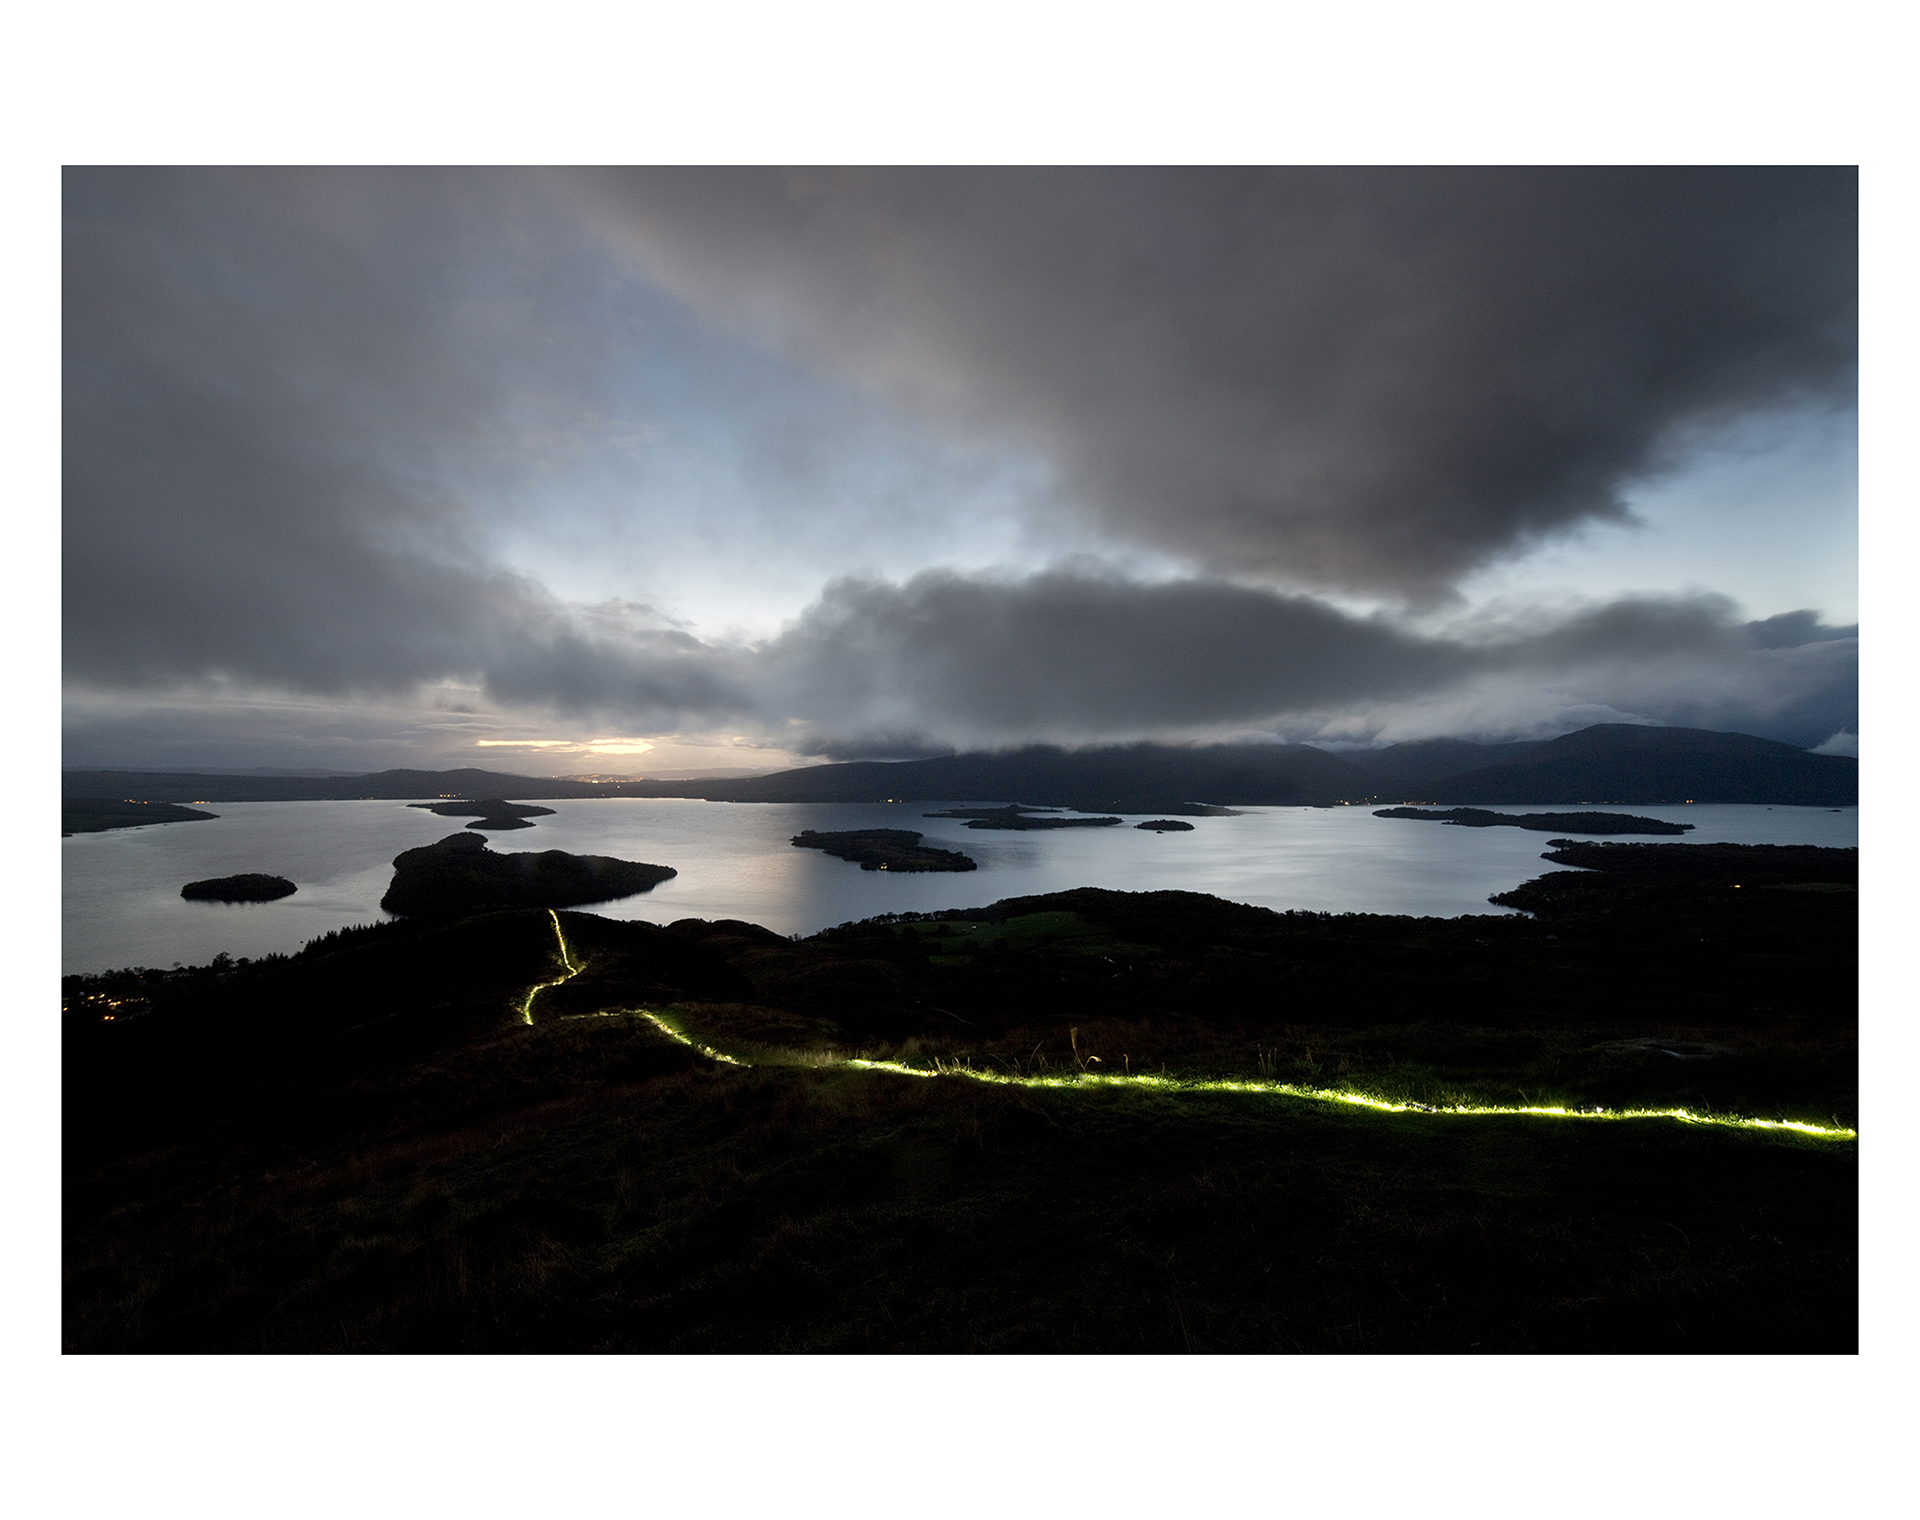 Image of Island Drift I (6/11/2013) by NVA, James Johnson & Alan McAteer